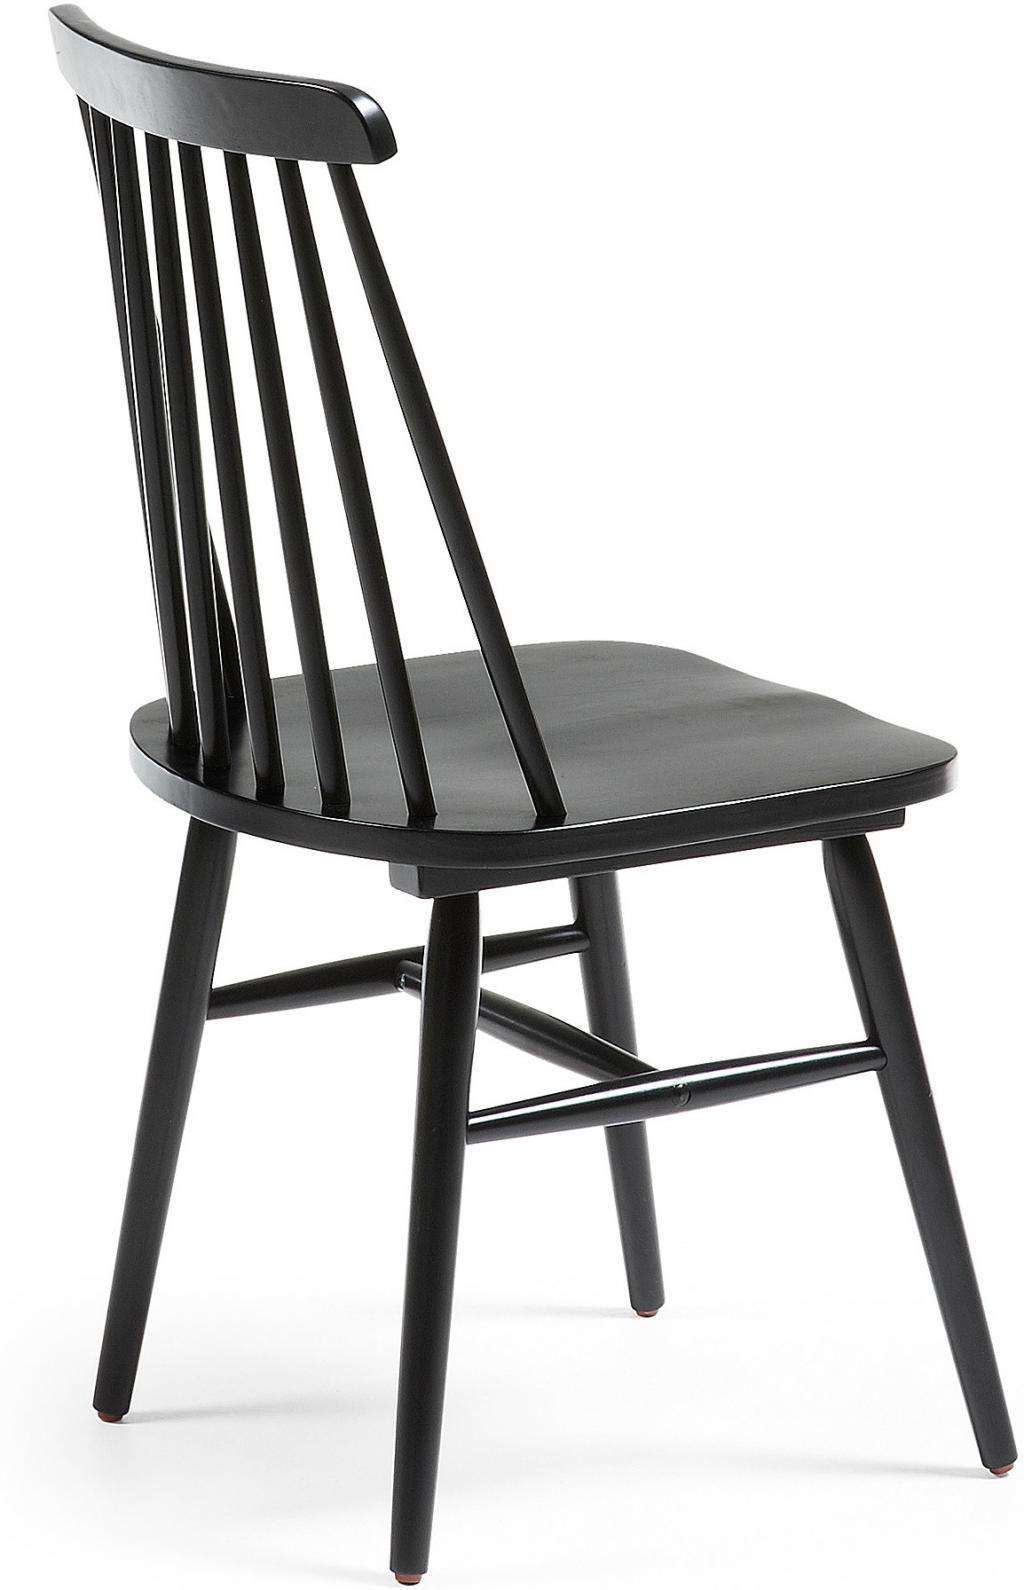 stuhl kristie holz schwarz la forma kaufen. Black Bedroom Furniture Sets. Home Design Ideas